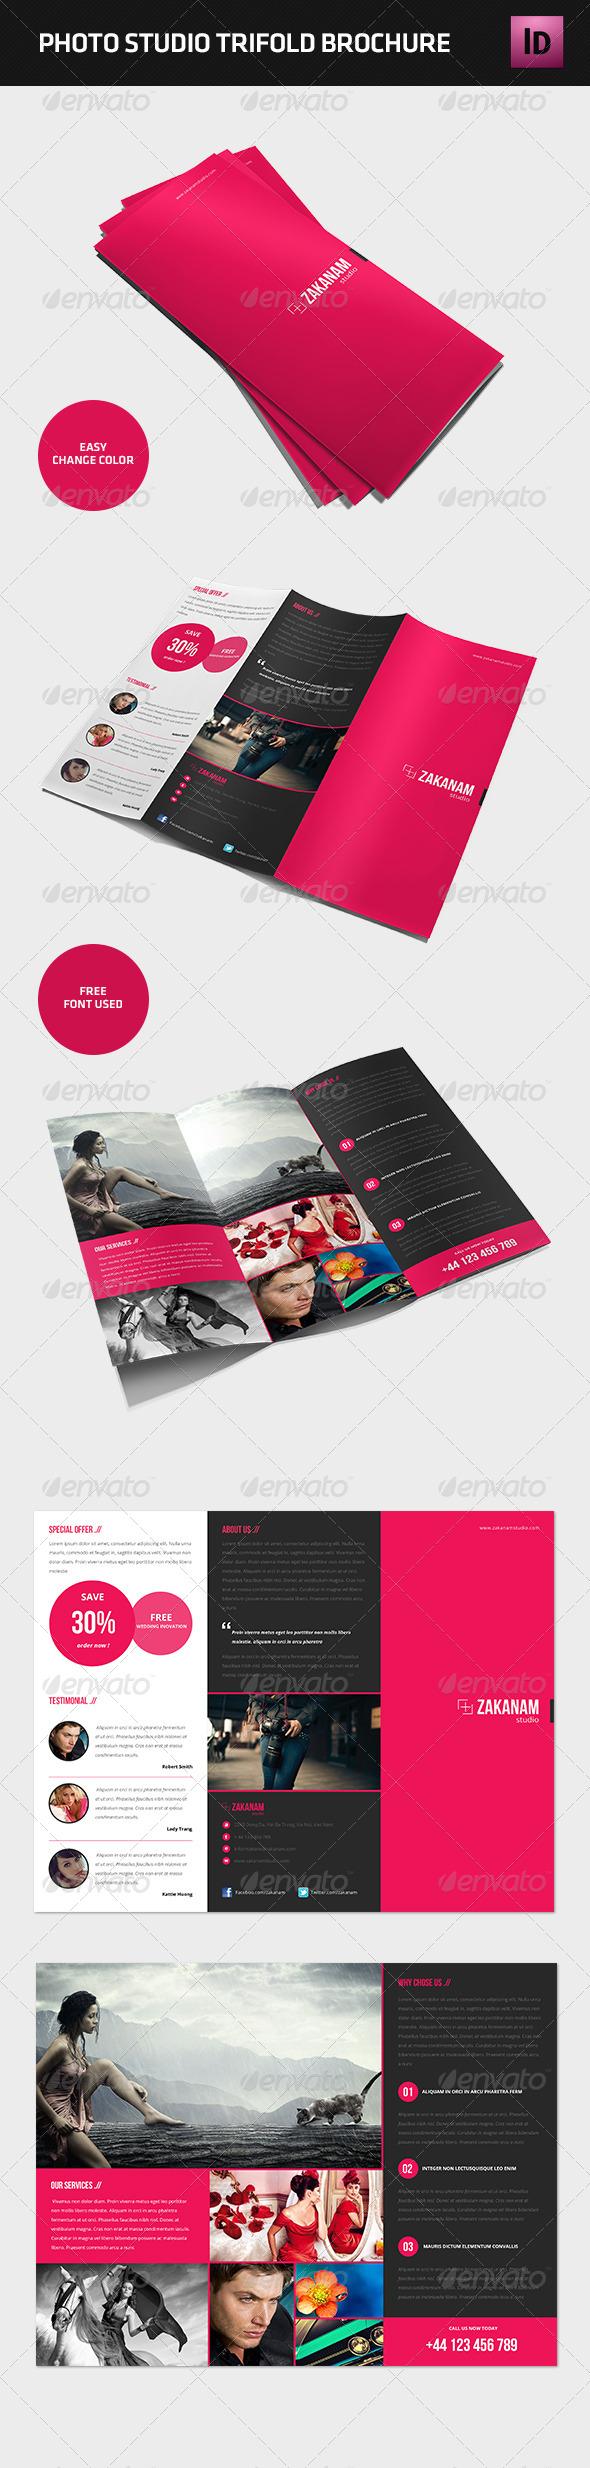 Modern Photography Studio Tri-Fold Brochure - Brochures Print Templates